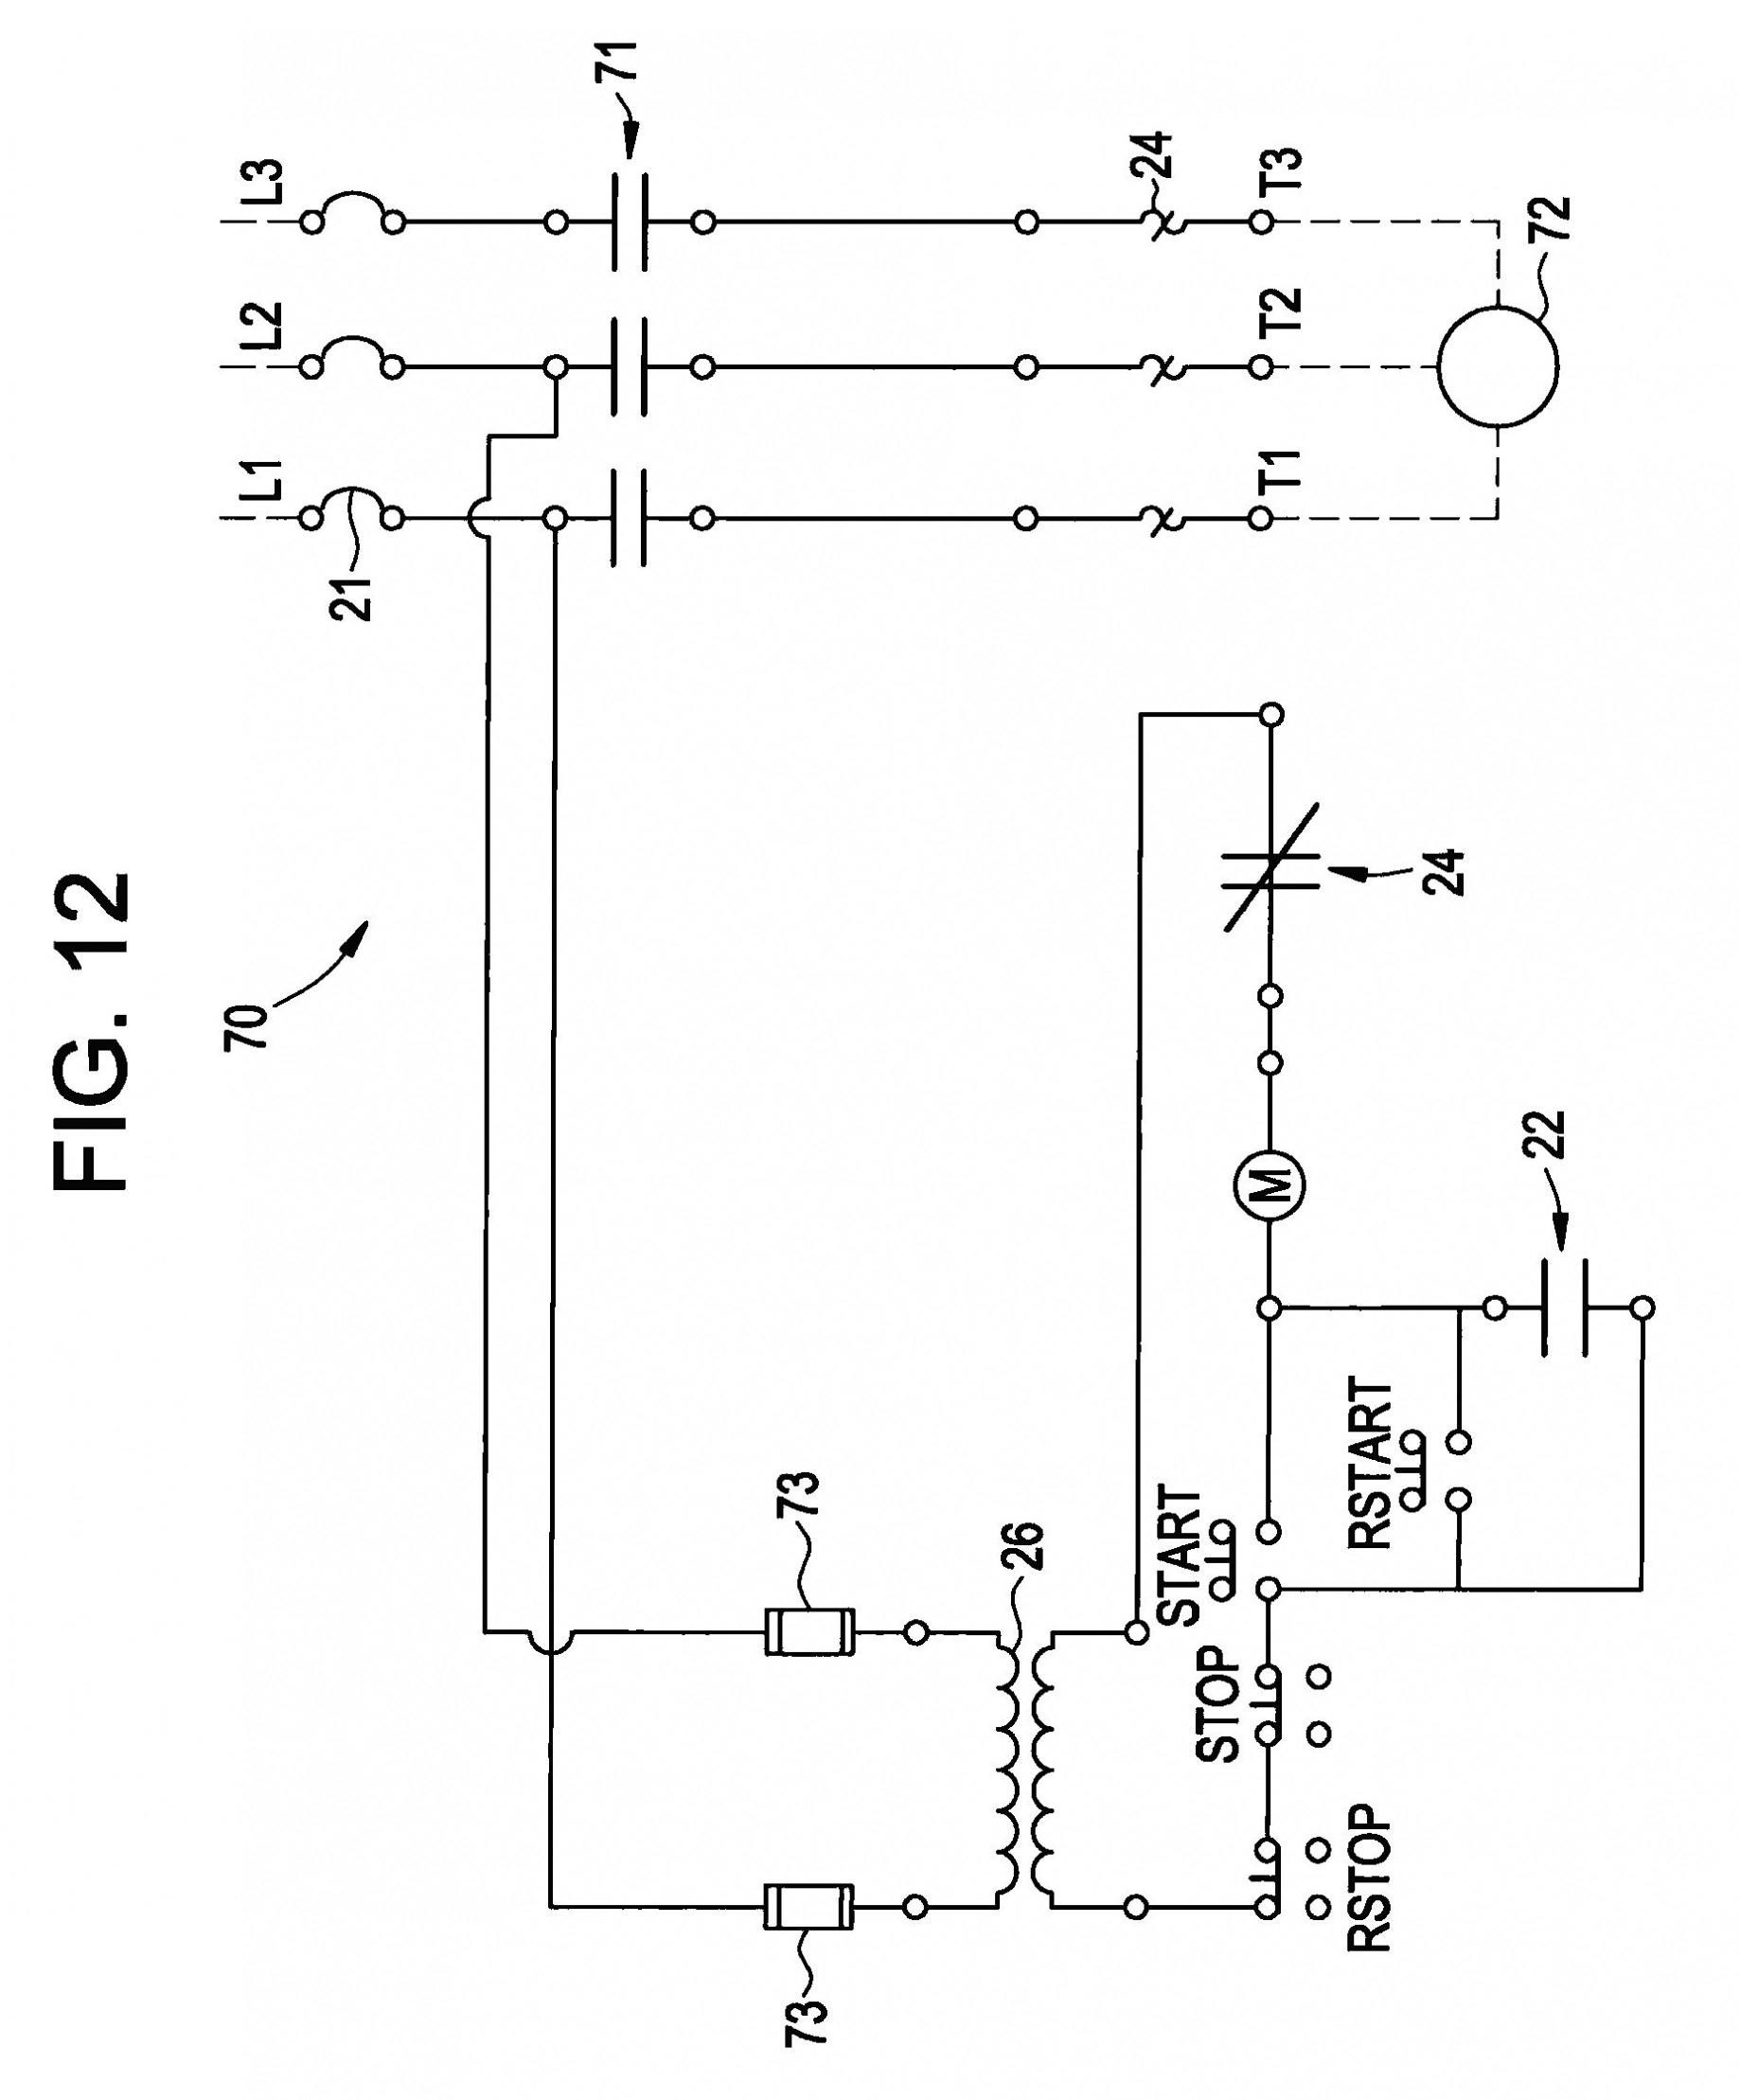 Nema L14 30 Wiring Diagram Best Of L14 30 Wiring Diagram - L14-30 Wiring Diagram